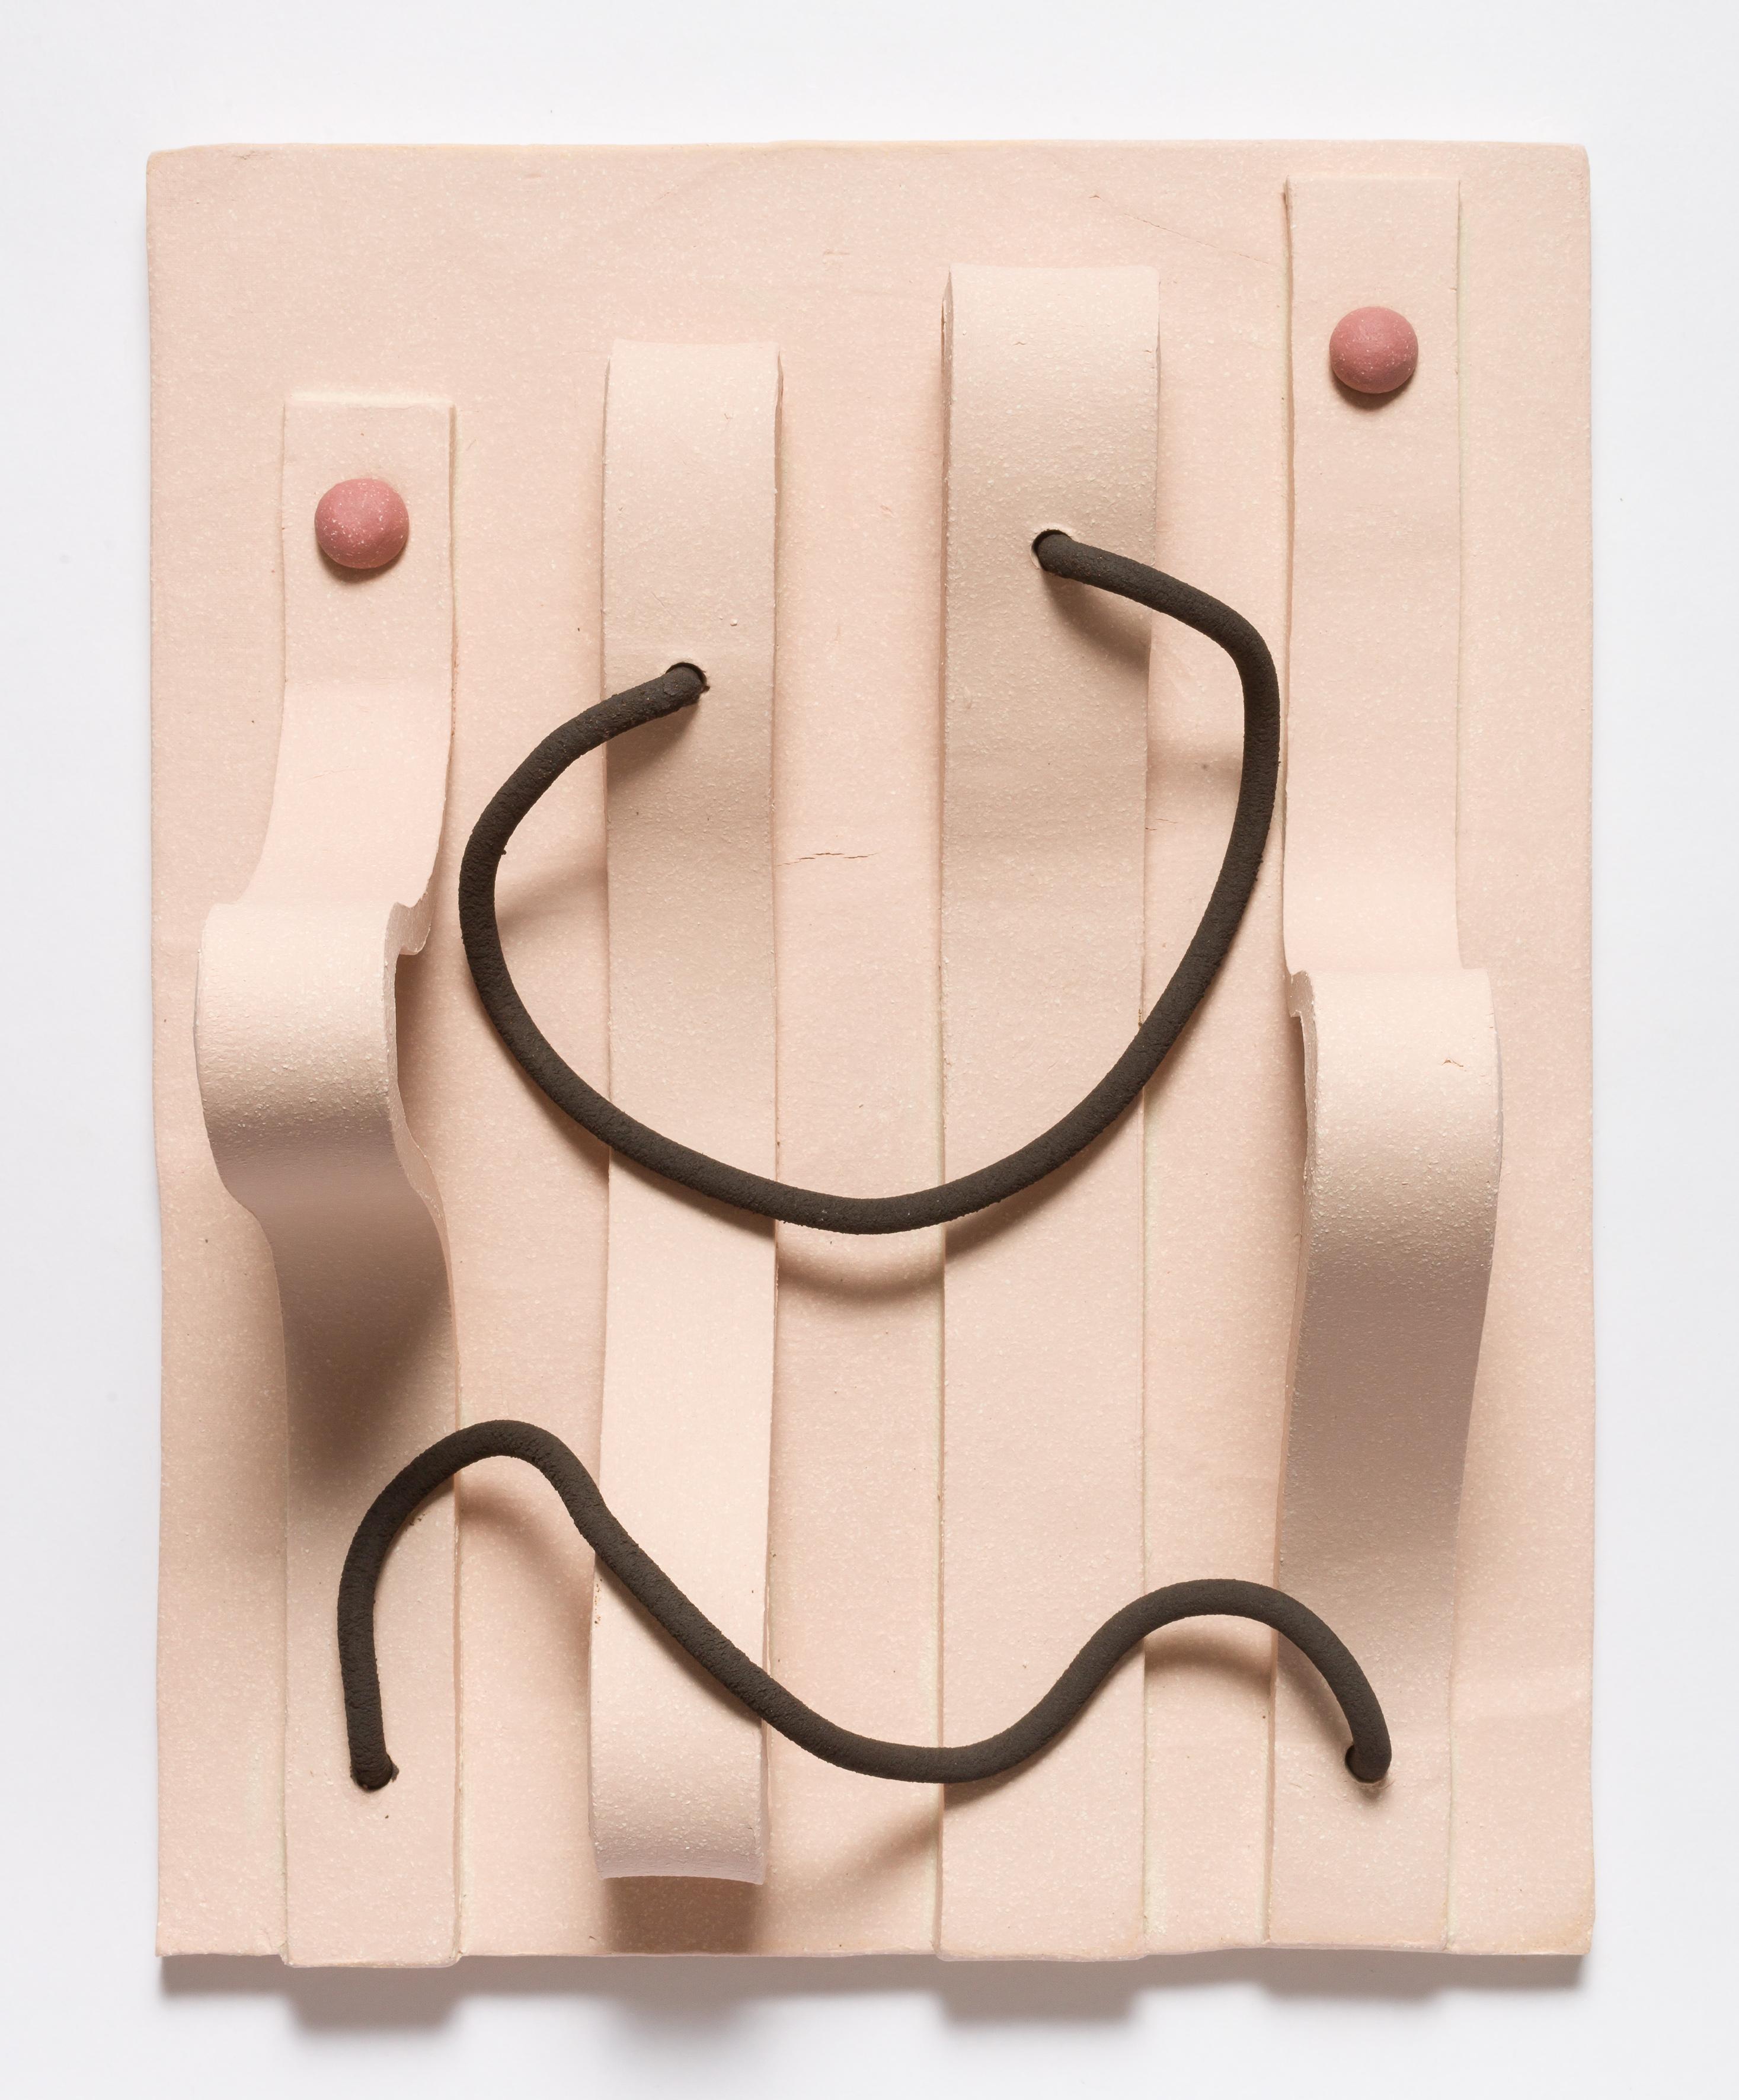 Jonathan Baldock, Maske, XVII, 2019